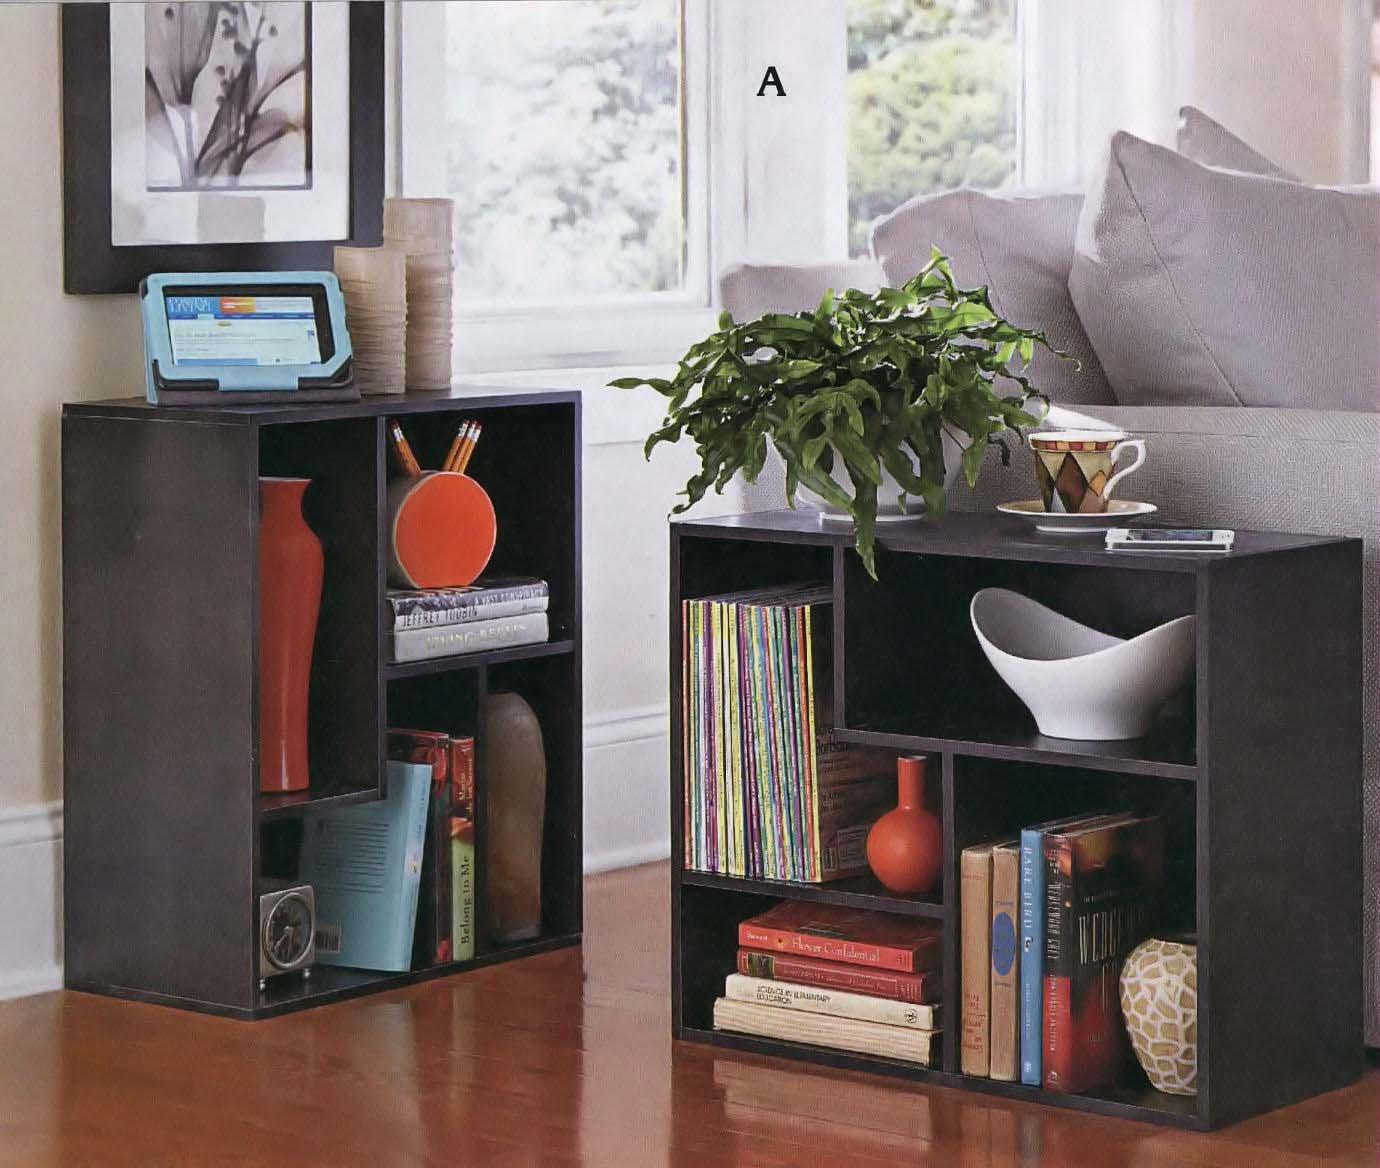 END TABLE BOOKCASE Versatile Multi-Compartment